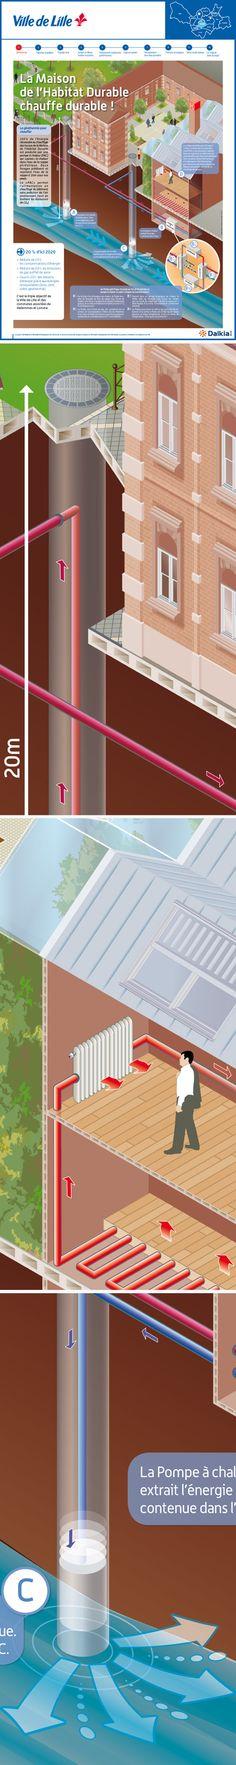 Block\u0027hood เกมสร้างเมืองอนาคตสุดเจ๋ง   sharevideoskingrpgnet